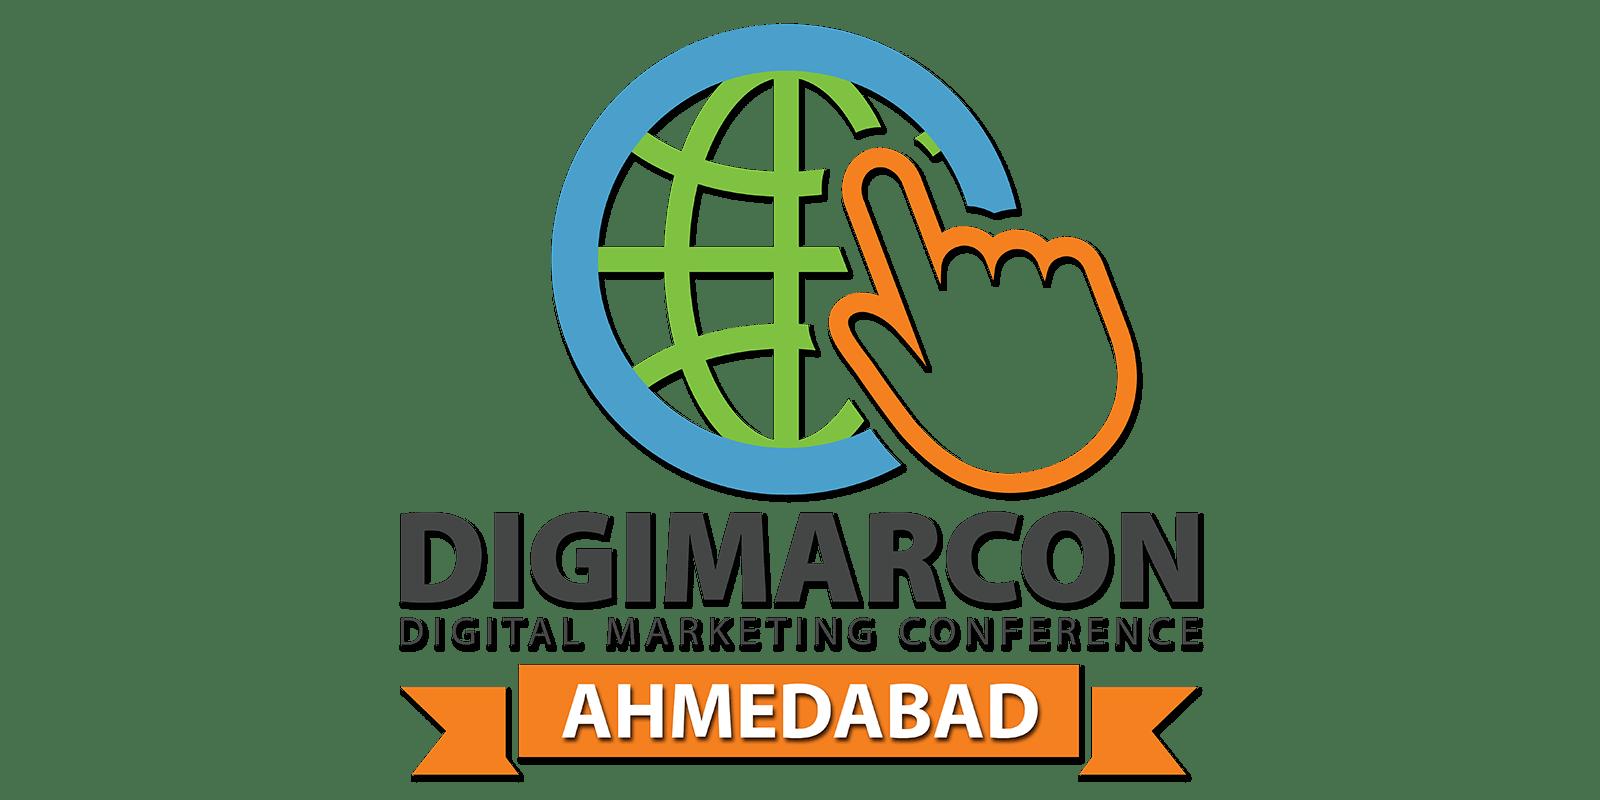 Ahmedabad Digital Marketing Conference